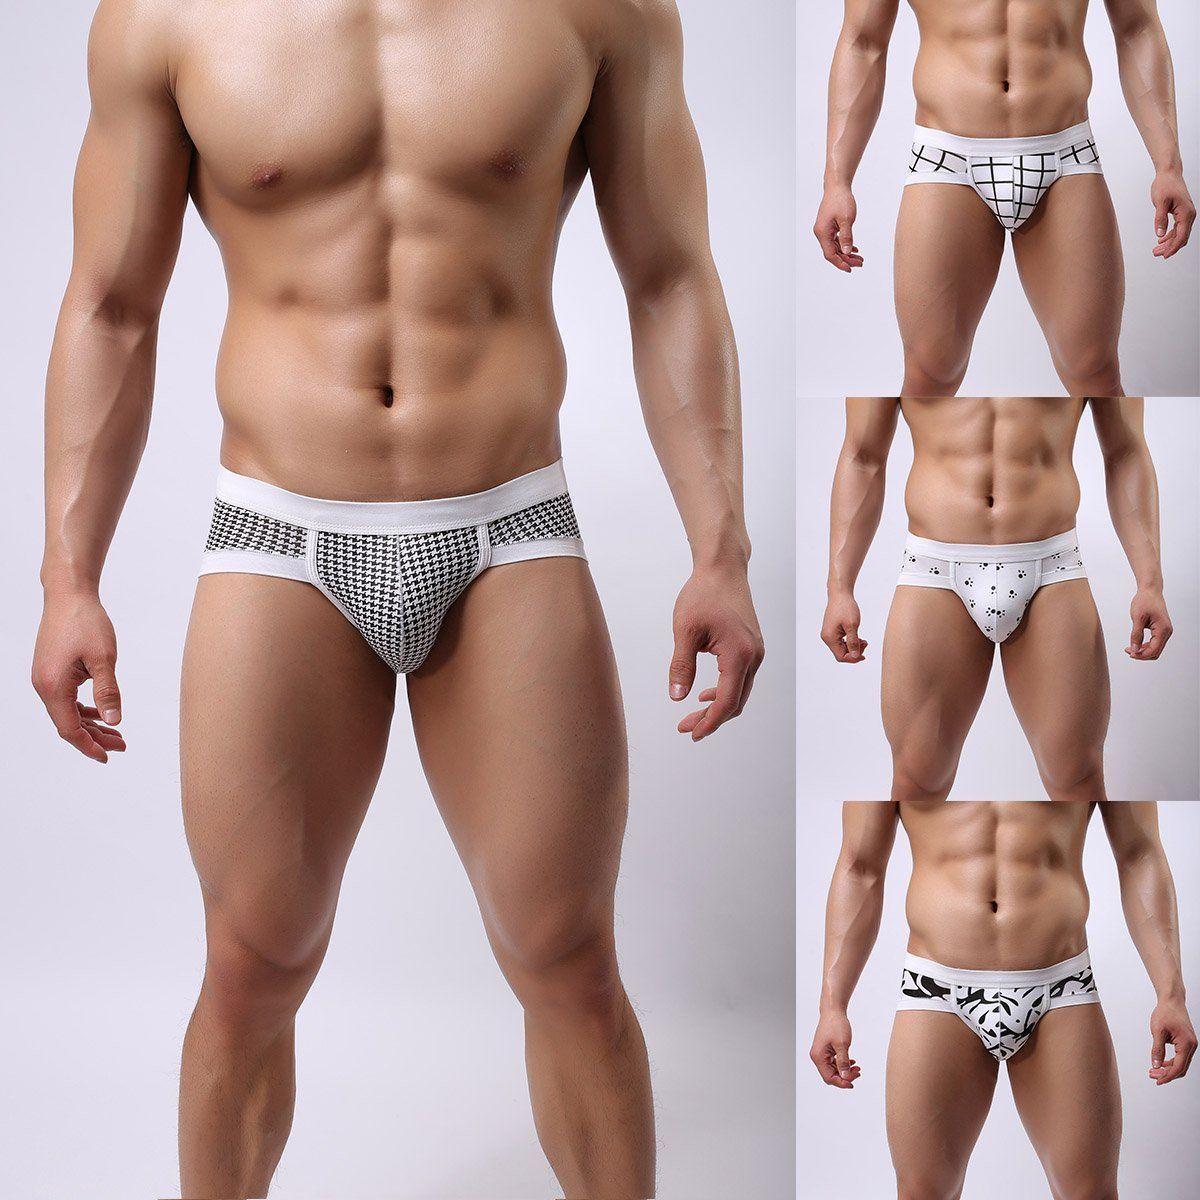 ffbf8672b090 $2.59 - Man Underwear Men's Breathable Cotton Boxer Briefs Shorts Bulge Pouch  Underpants #ebay #Fashion